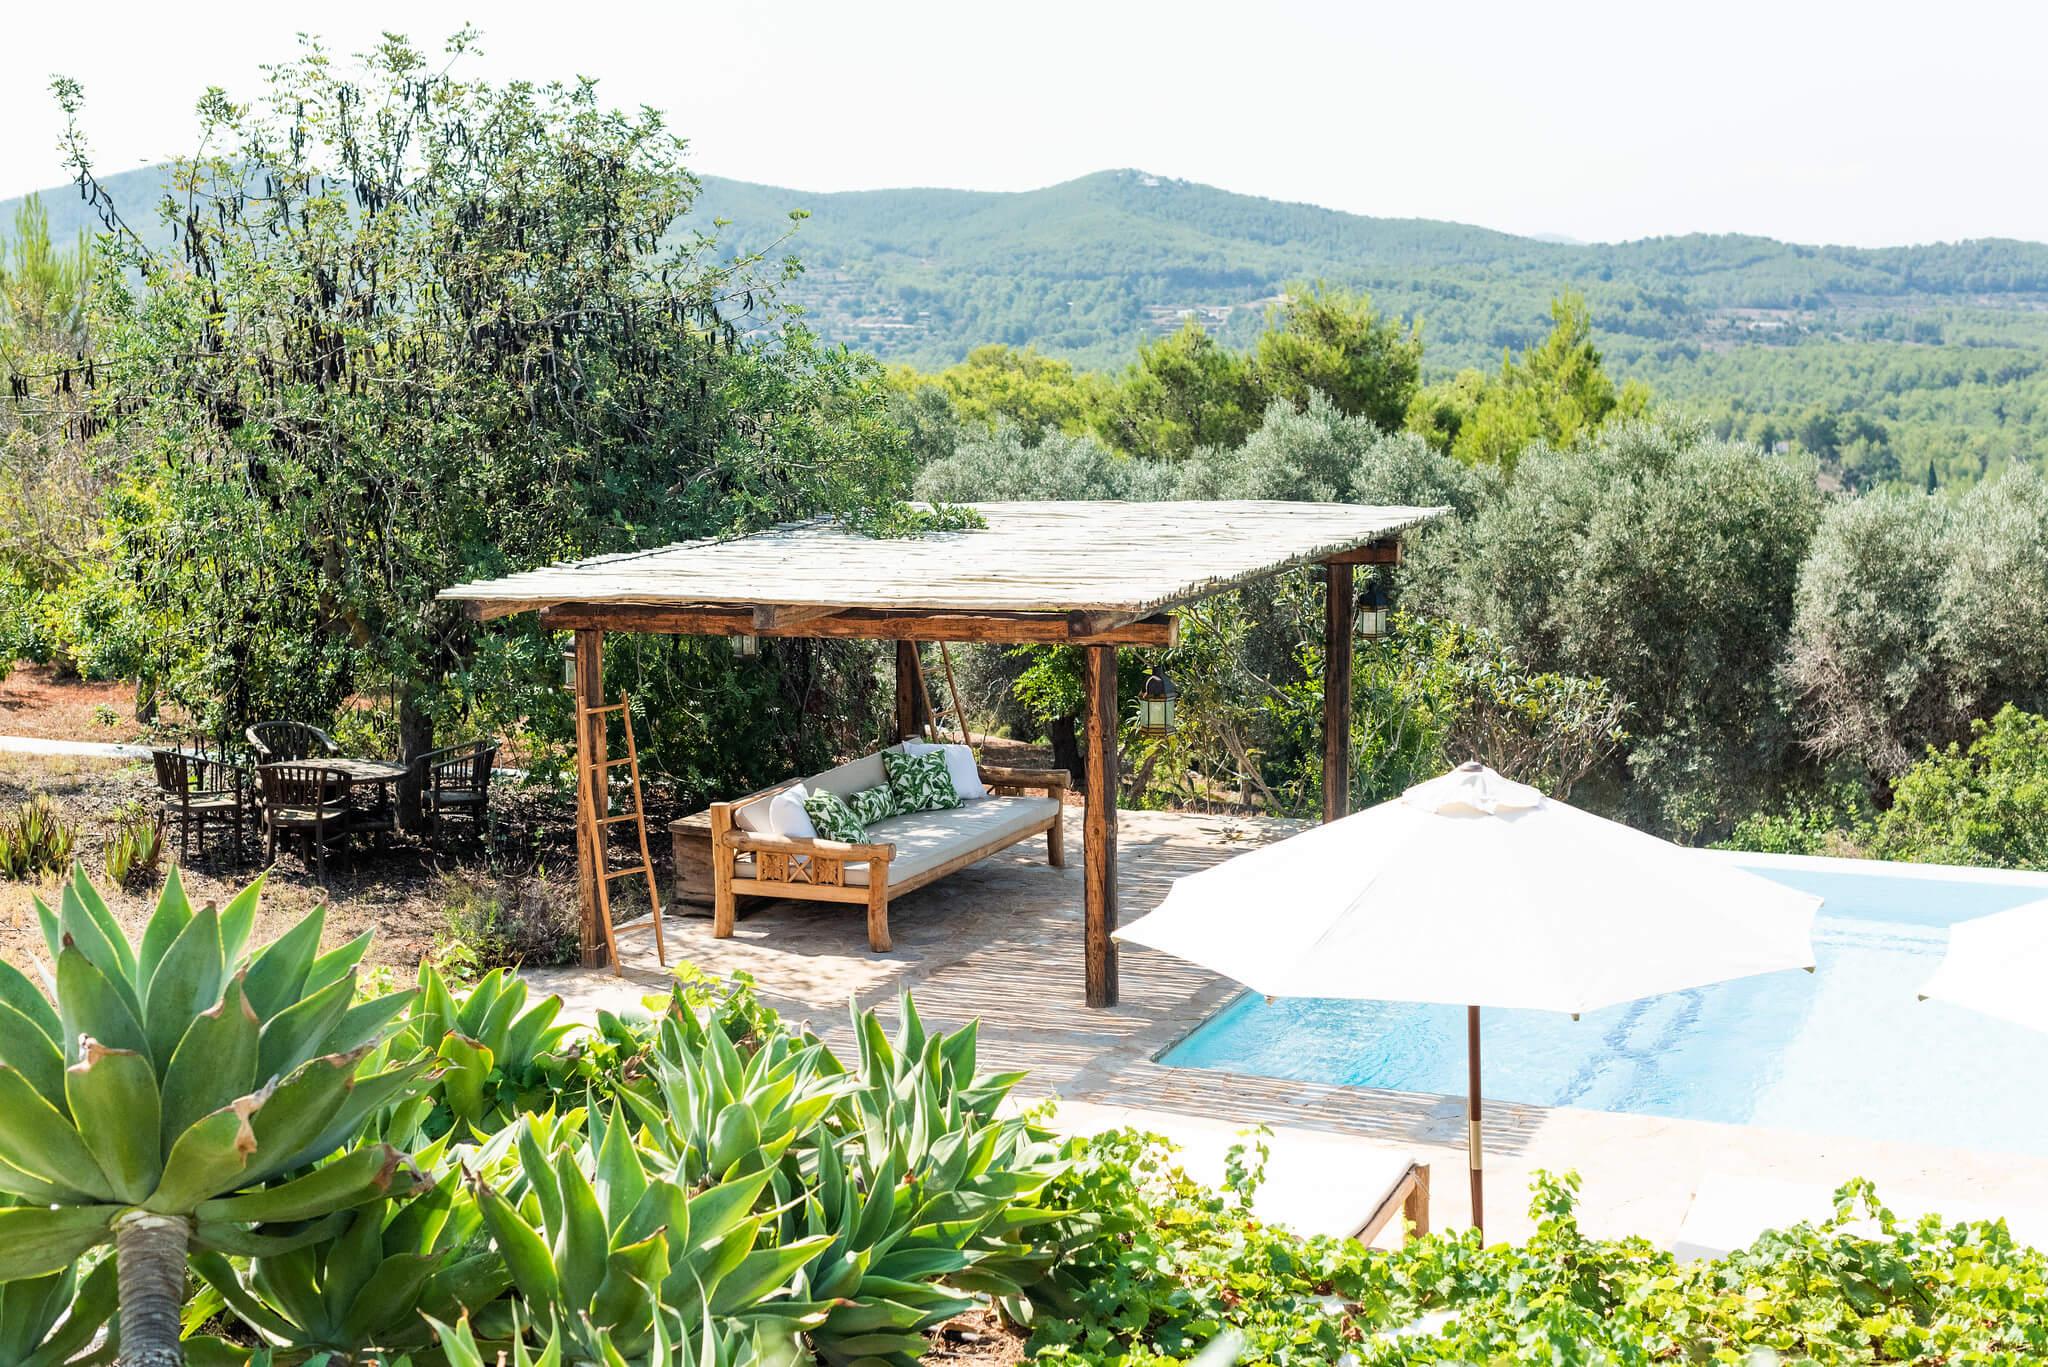 https://www.white-ibiza.com/wp-content/uploads/2020/05/white-ibiza-villas-can-lavanda-poolside-chill-out.jpg